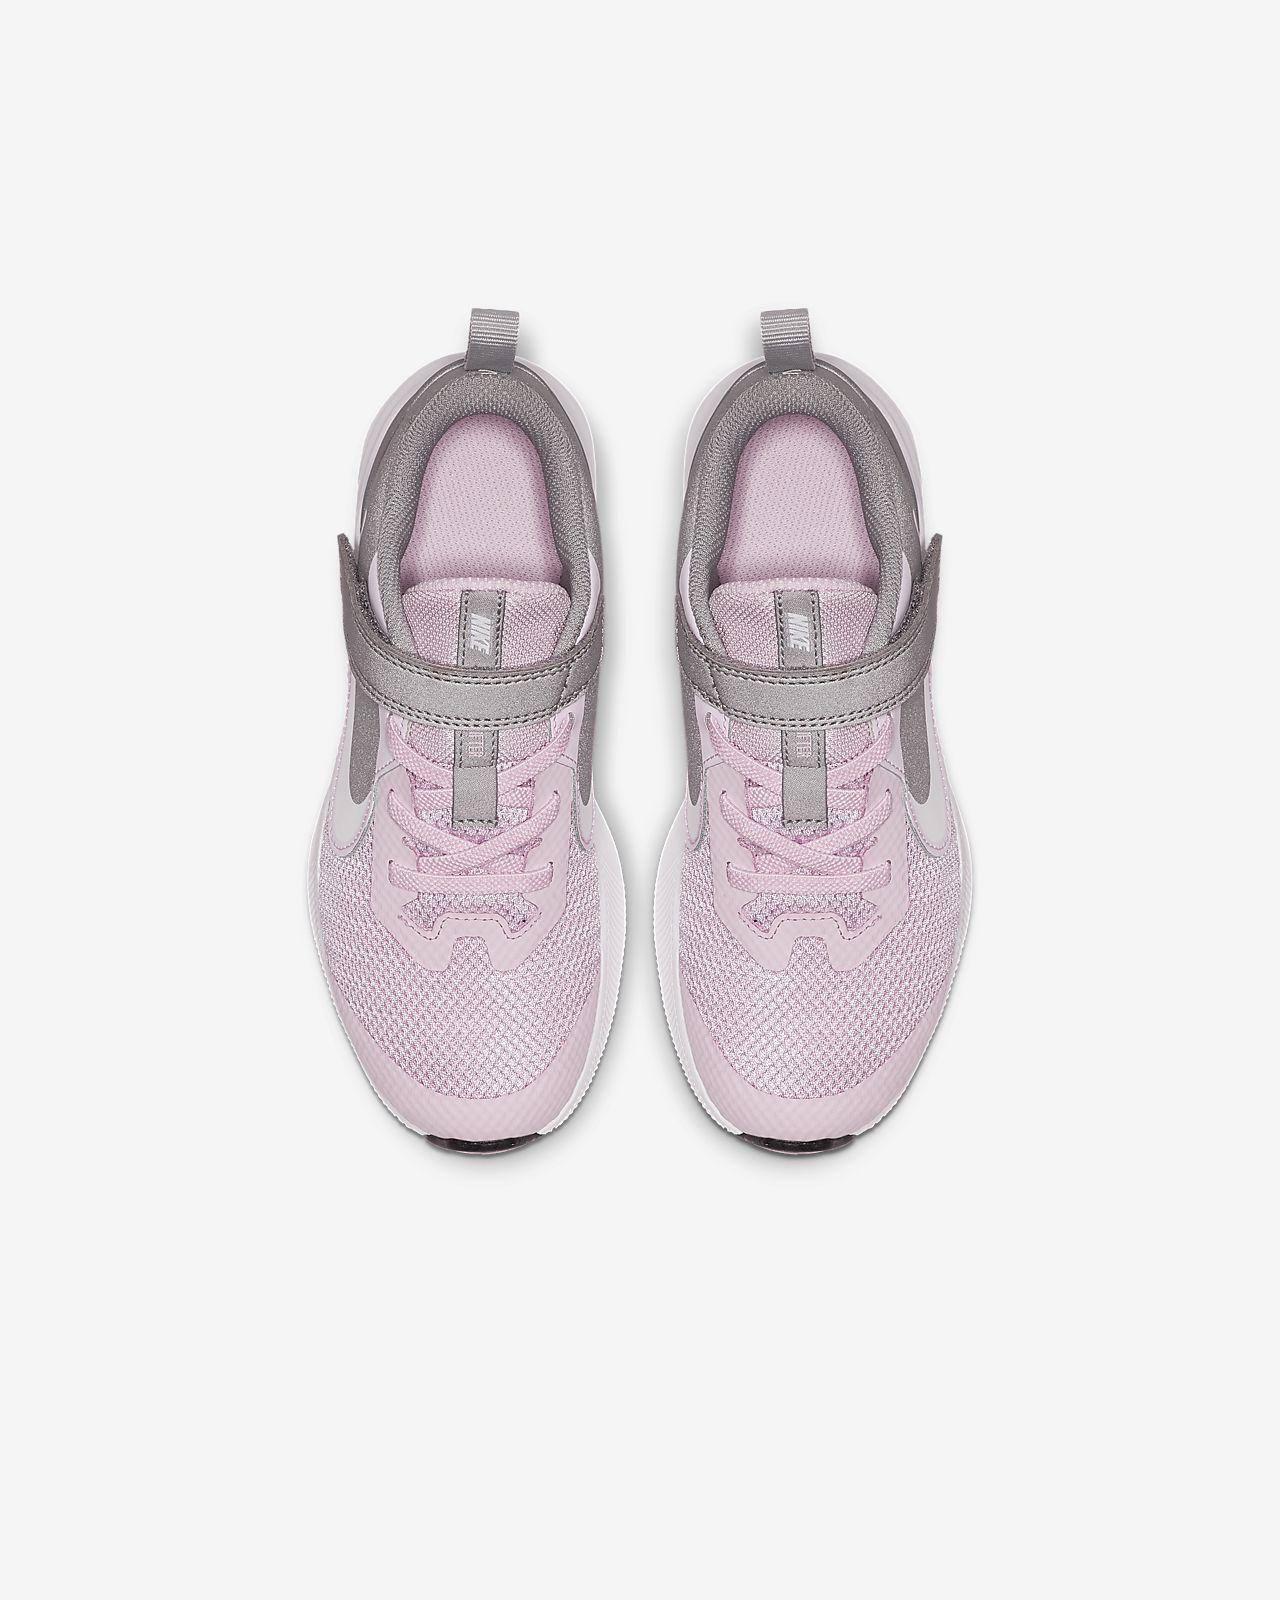 Toddler Girls' Nike Downshifter 7 Shoes |